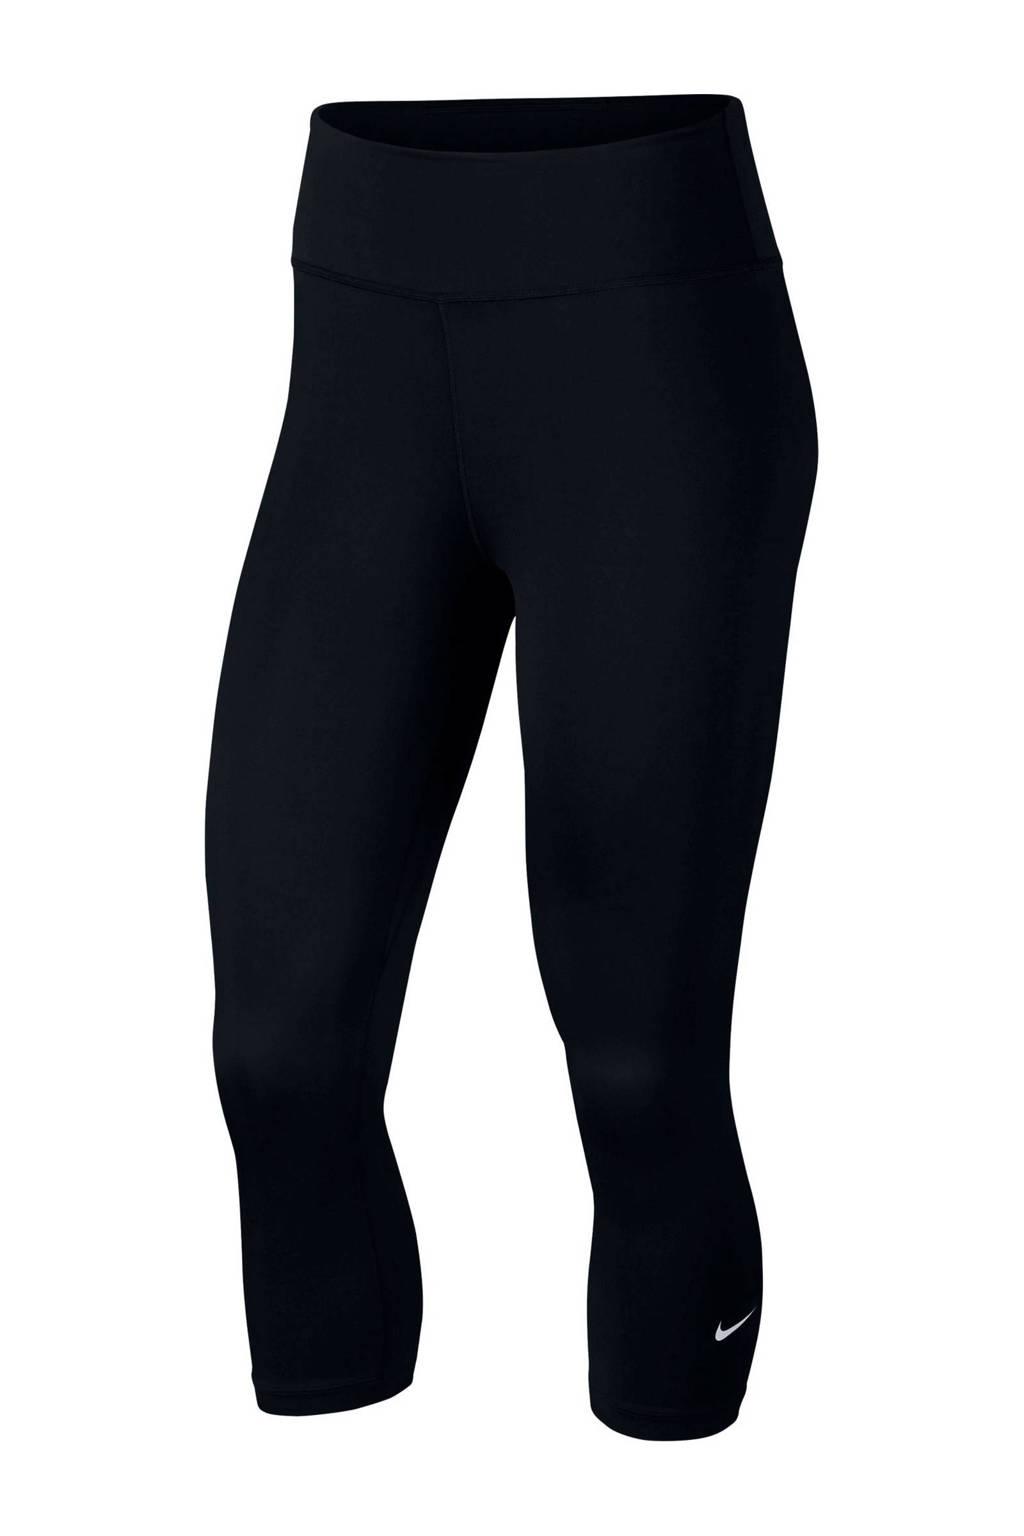 Nike sportlegging zwart, Zwart